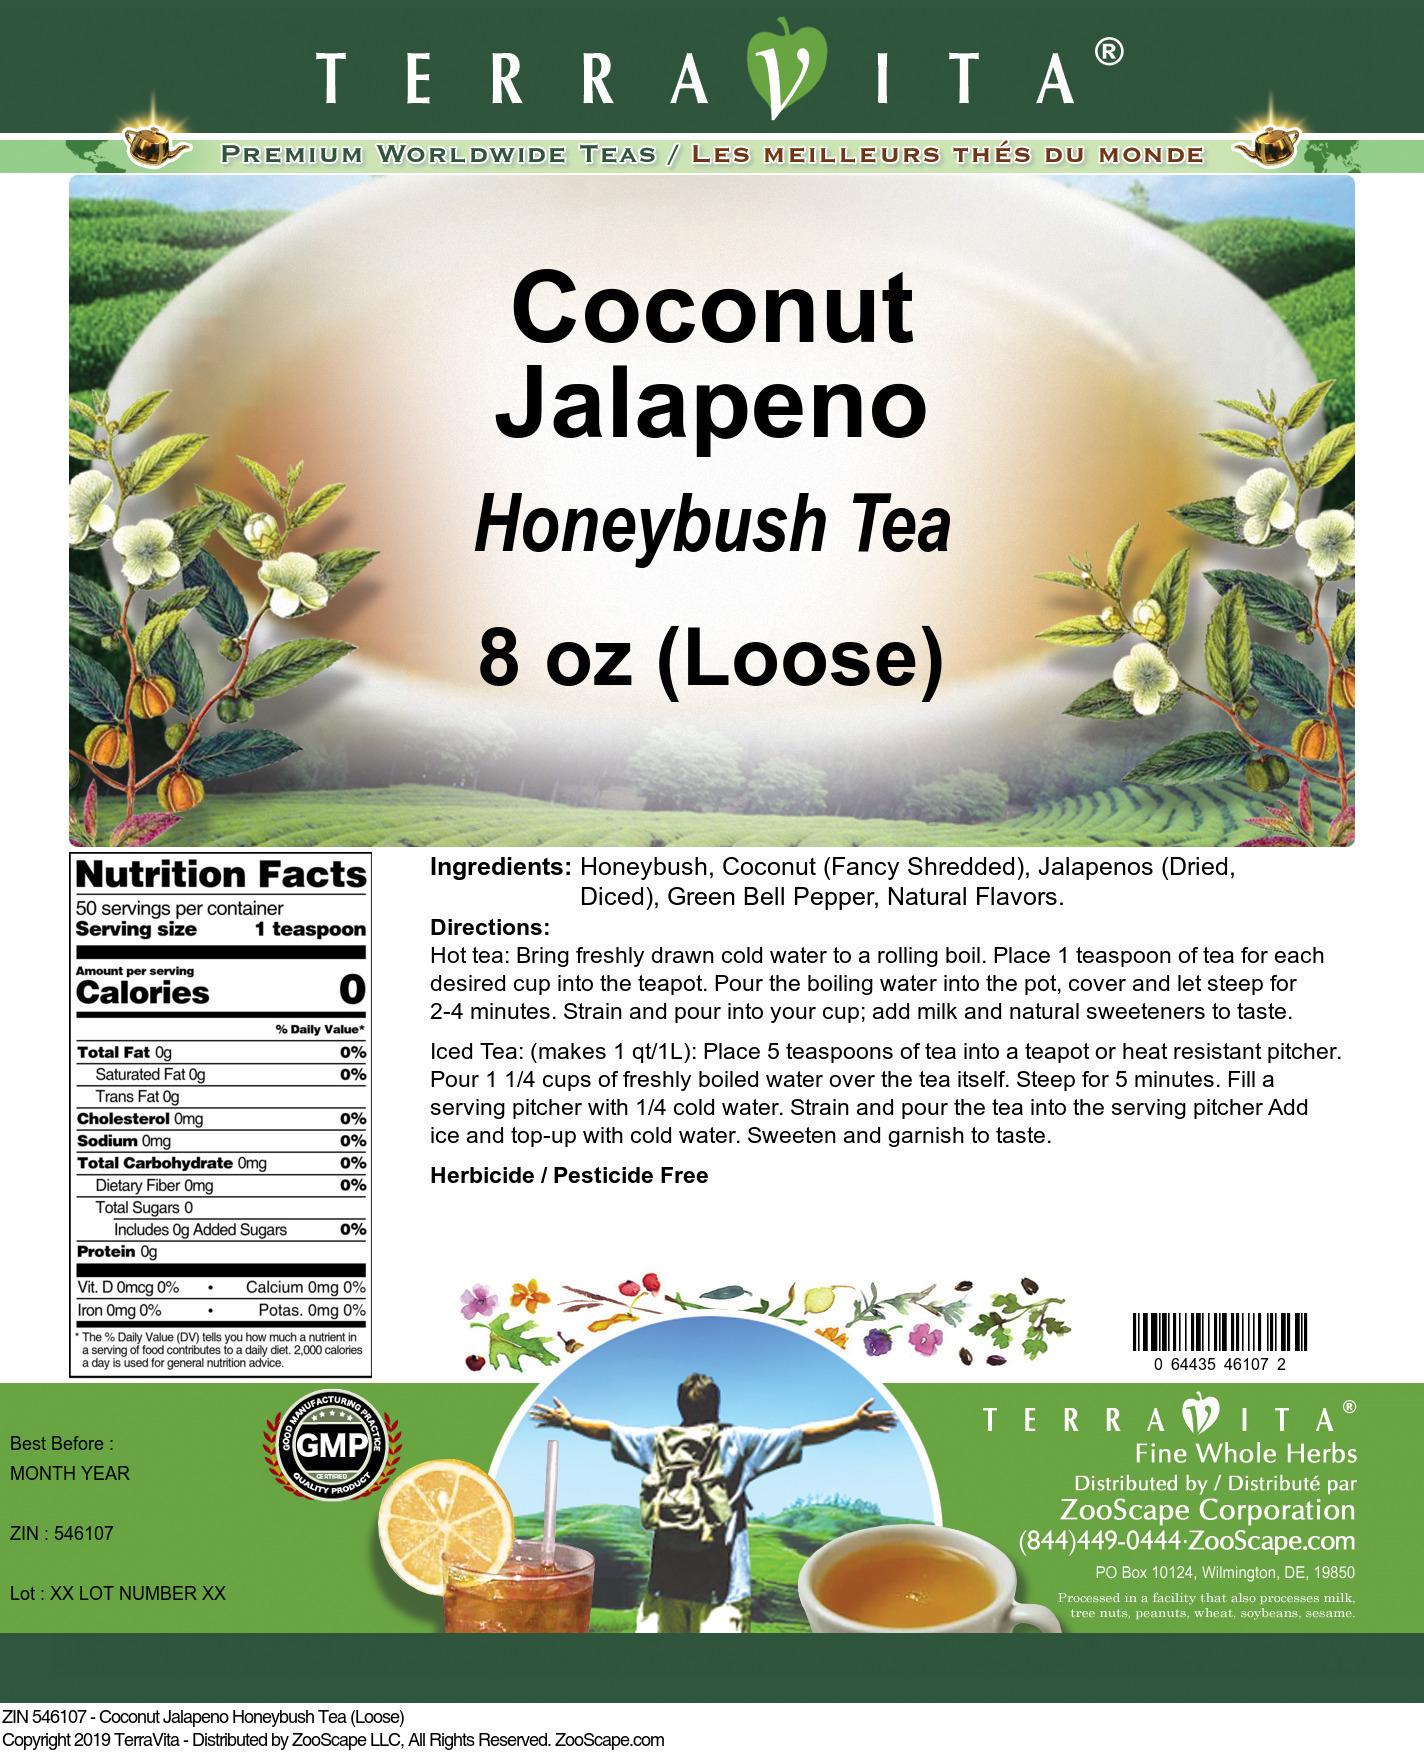 Coconut Jalapeno Honeybush Tea (Loose)